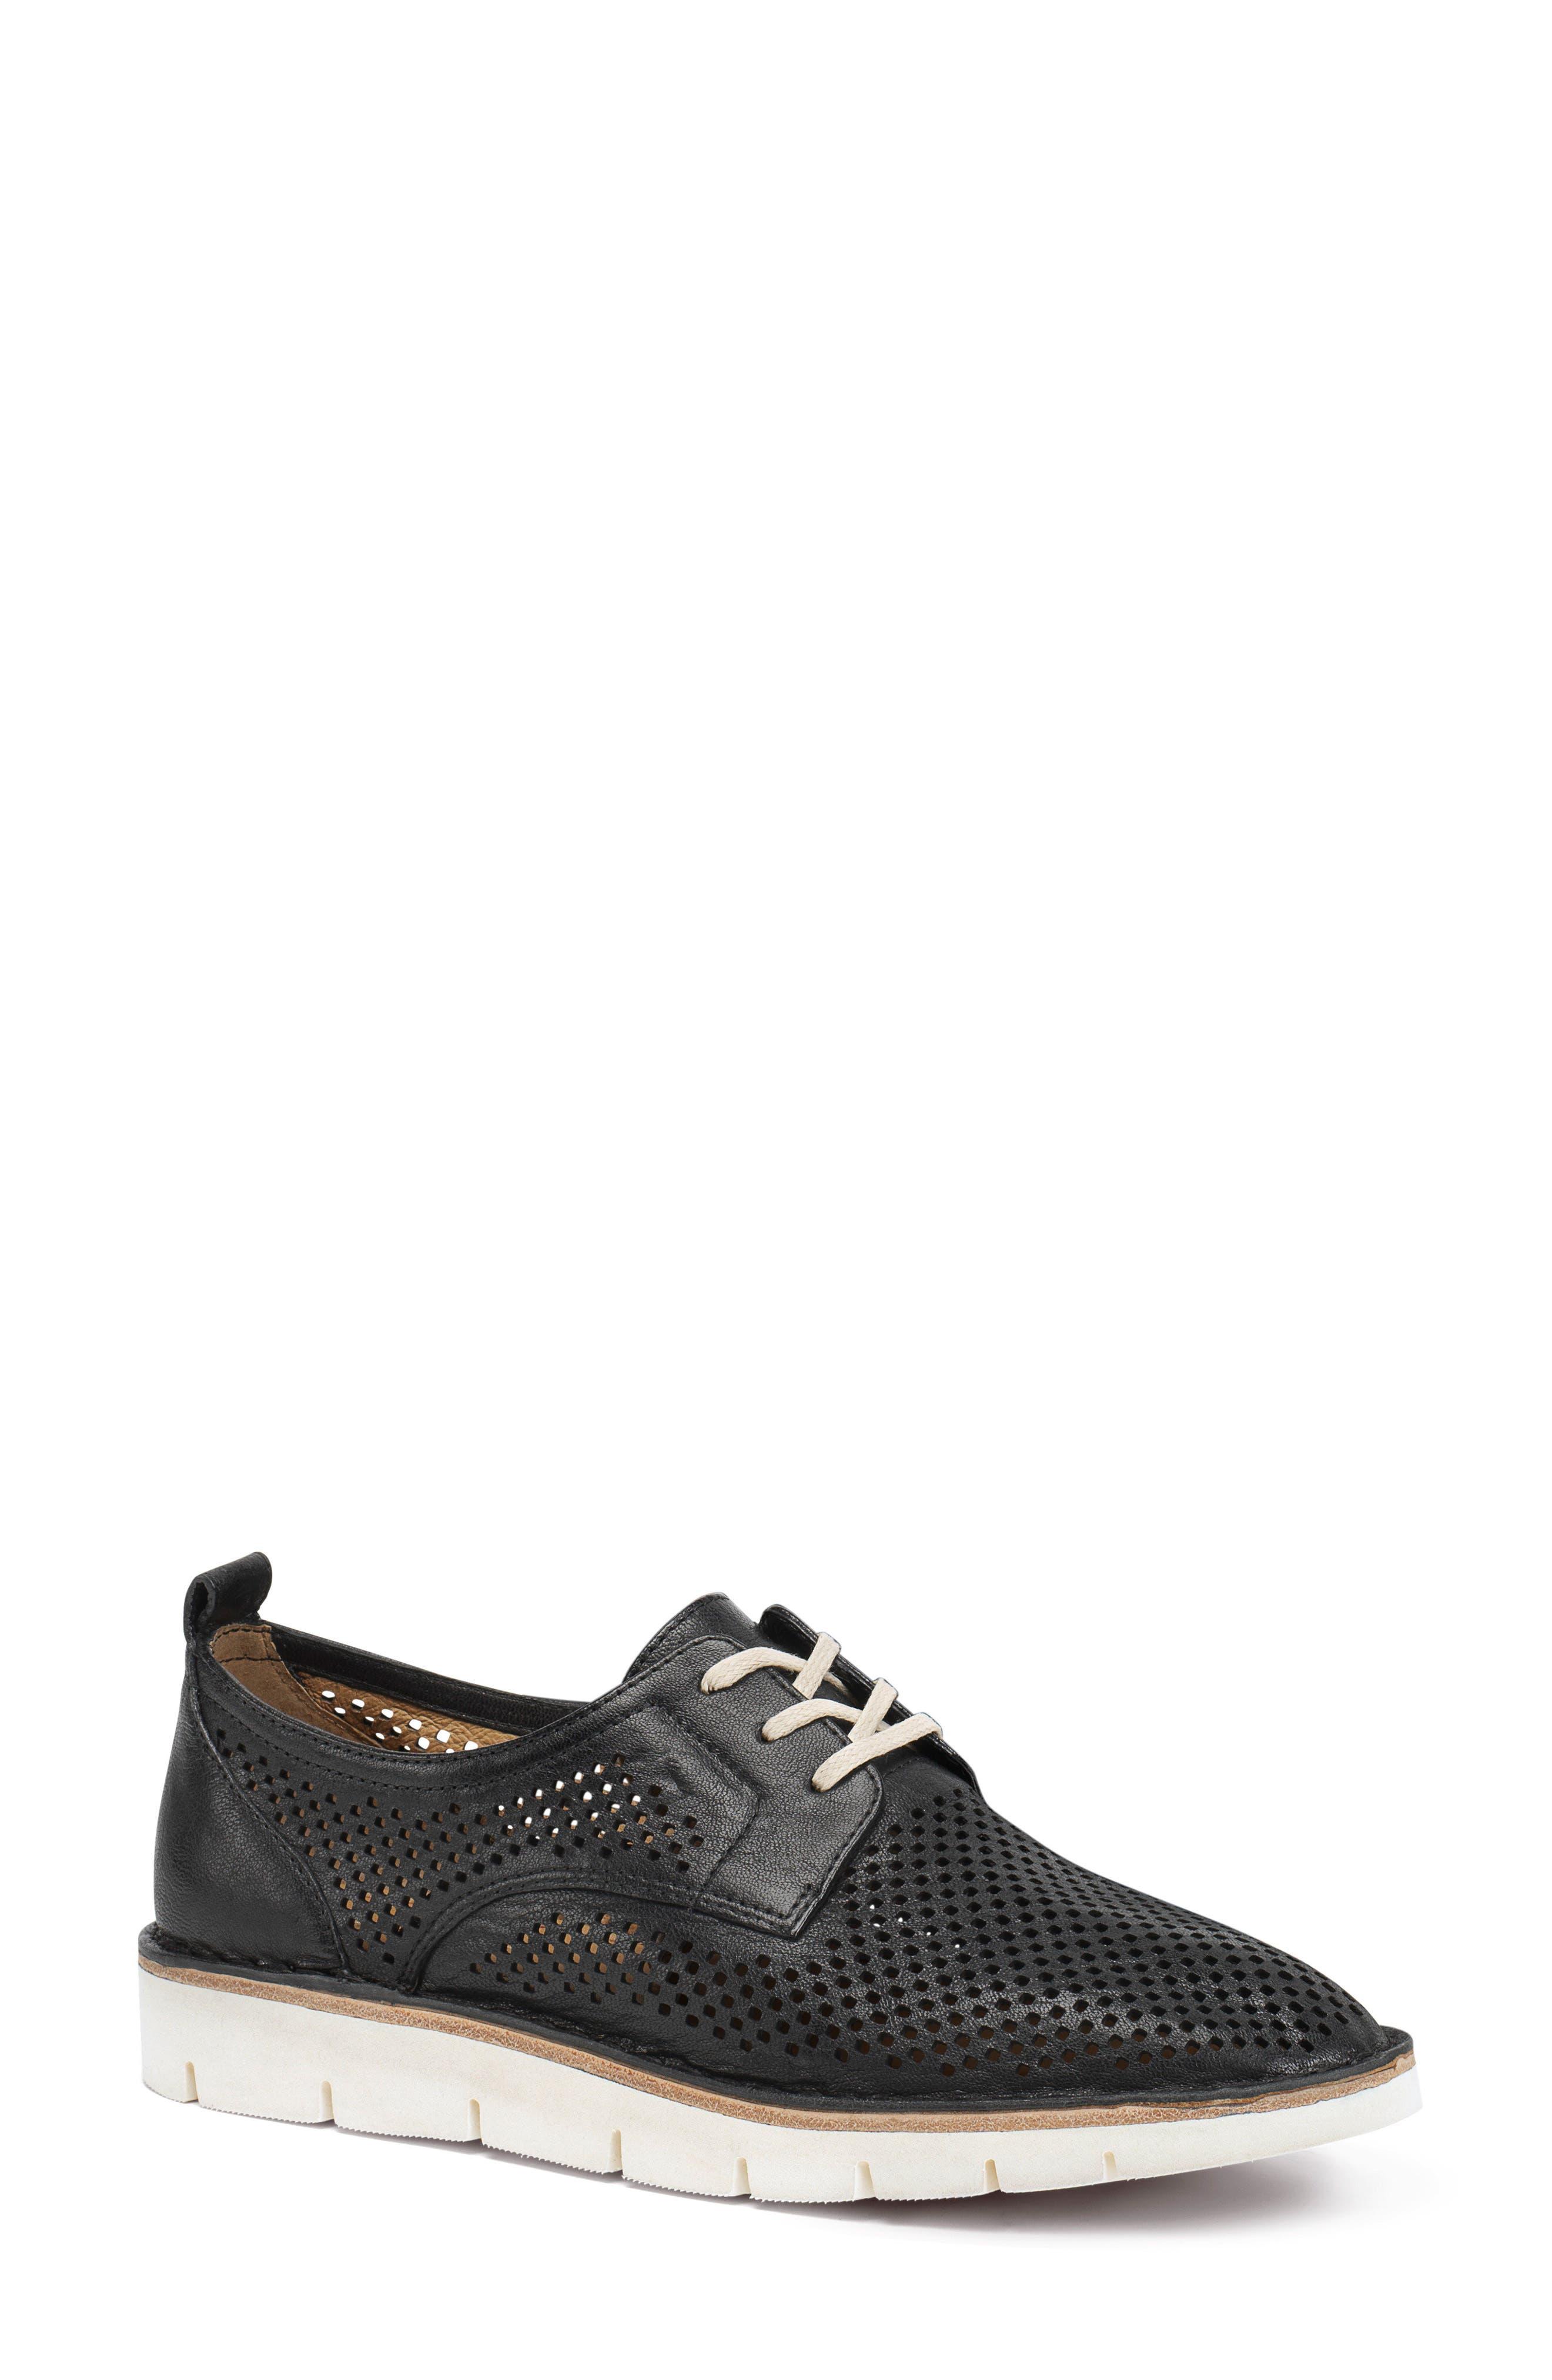 Lena Sneaker,                         Main,                         color, Black Leather